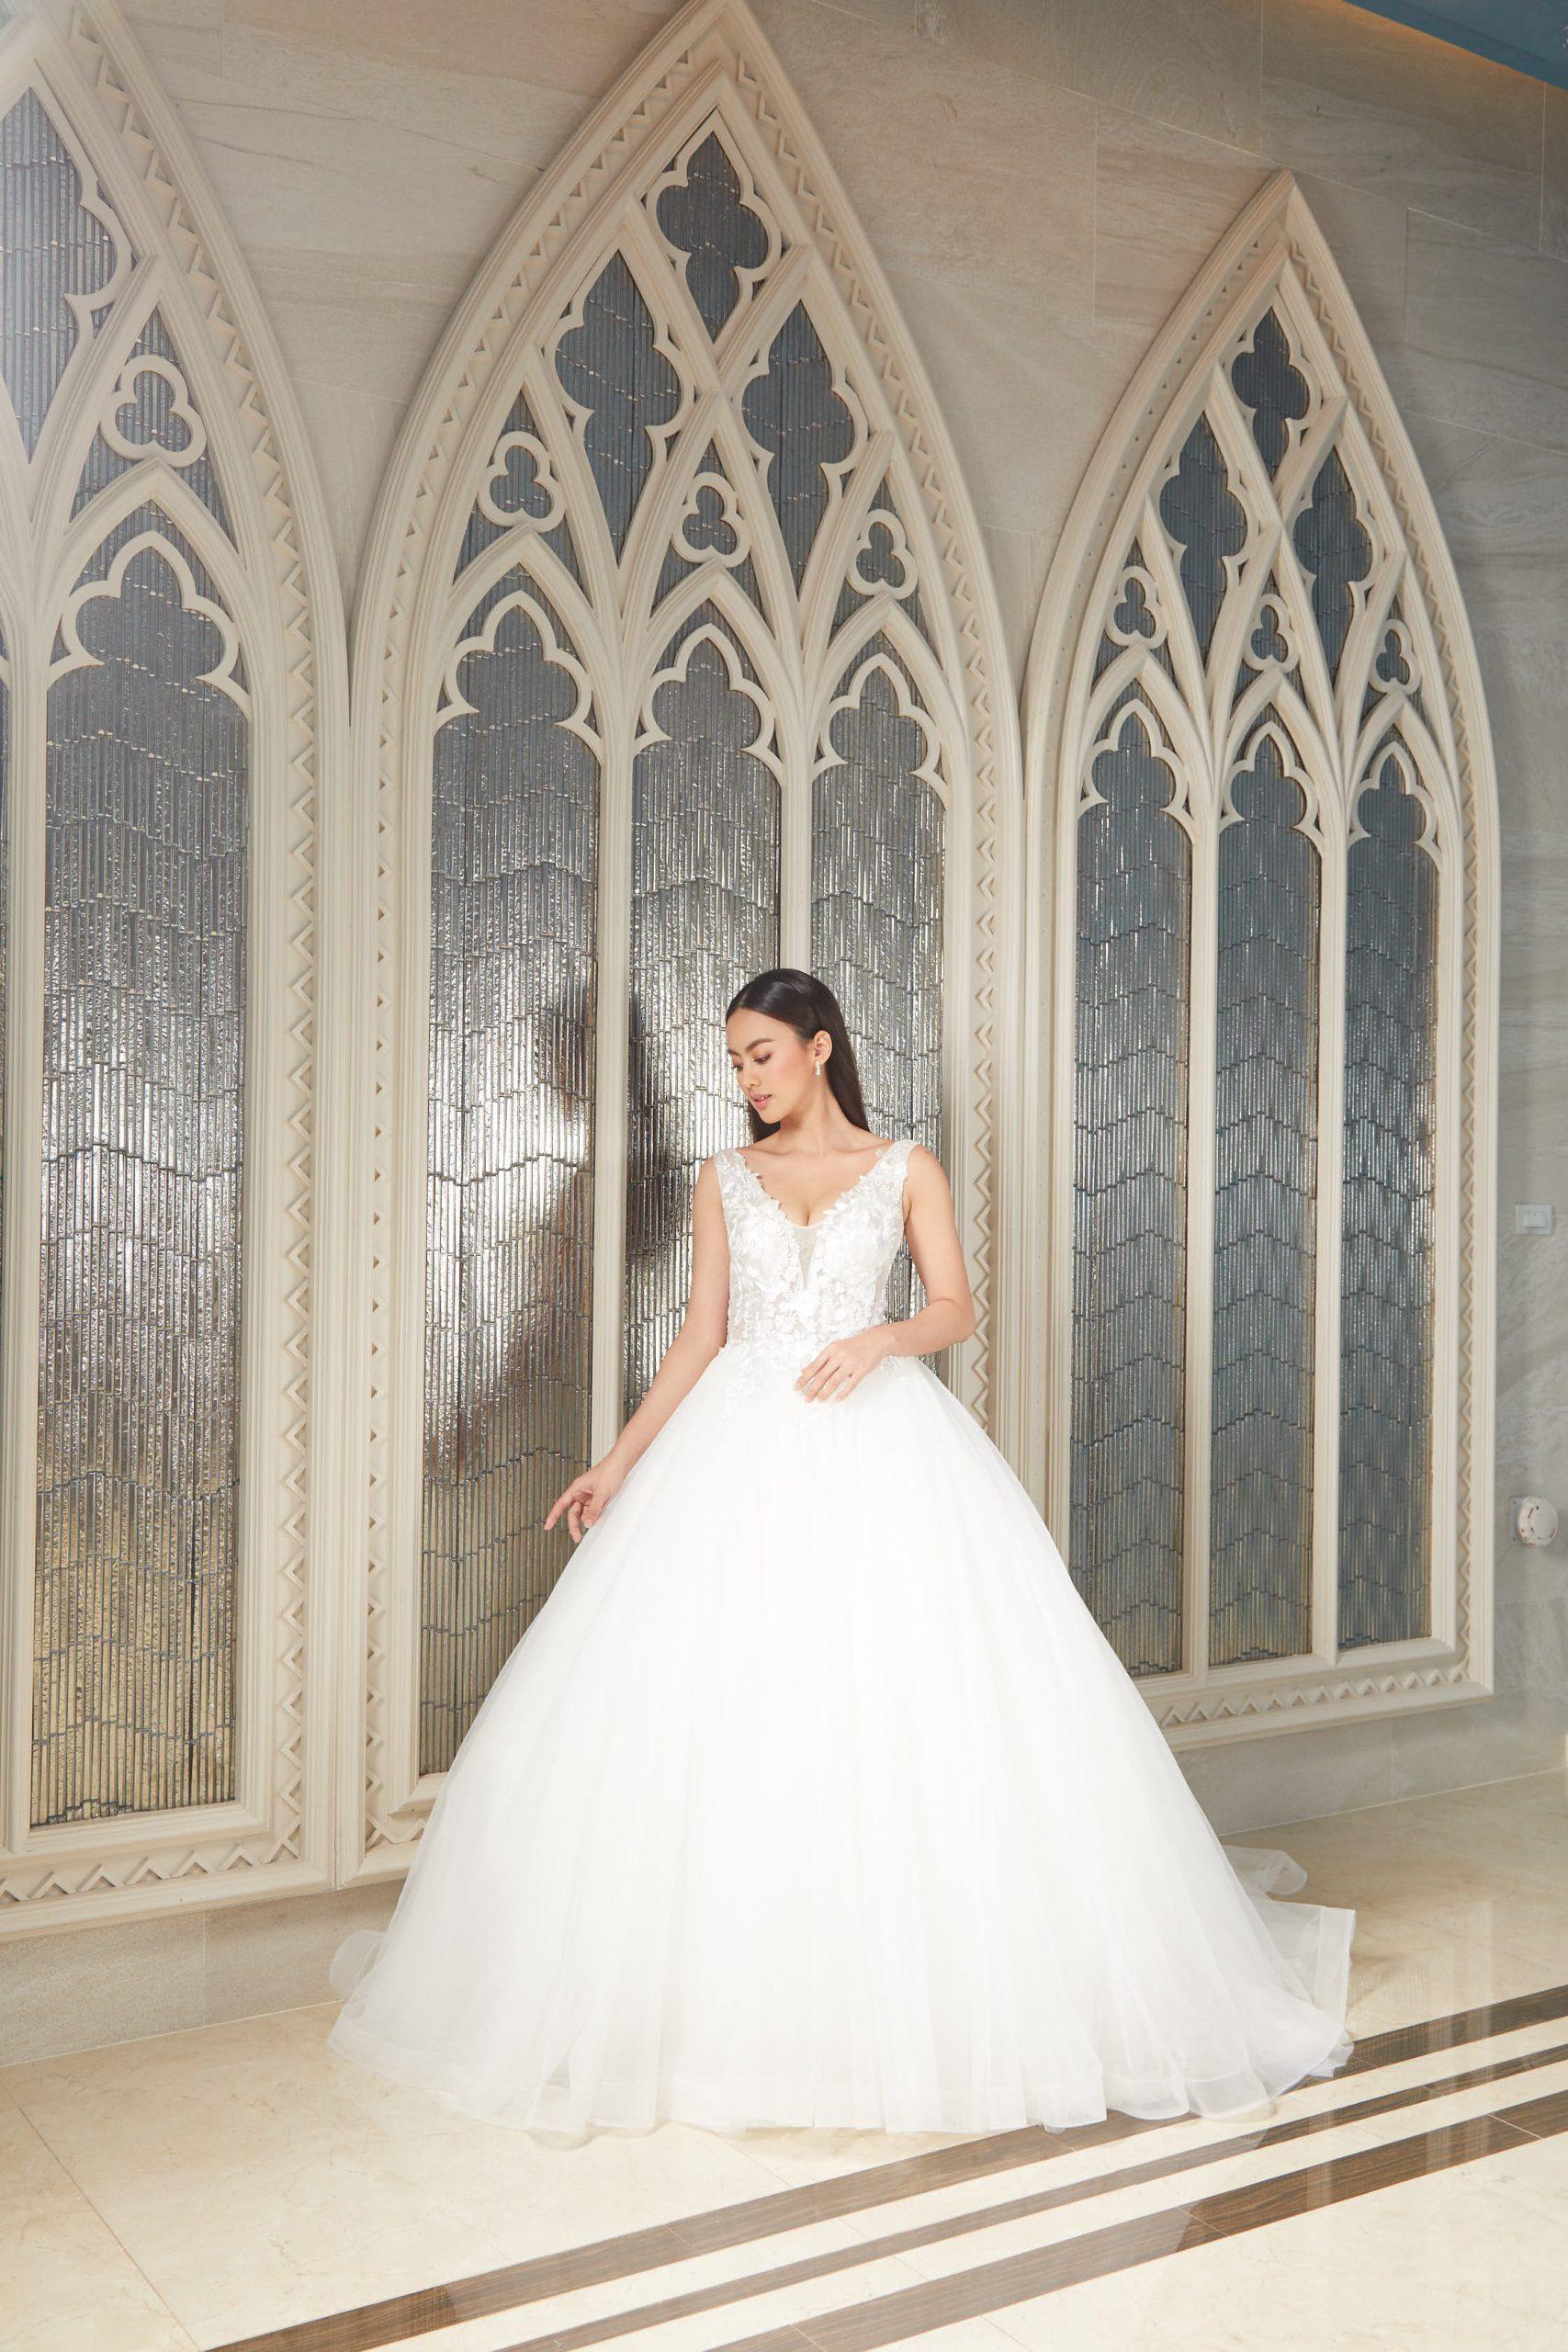 Praew Wedding 21-10-1910802